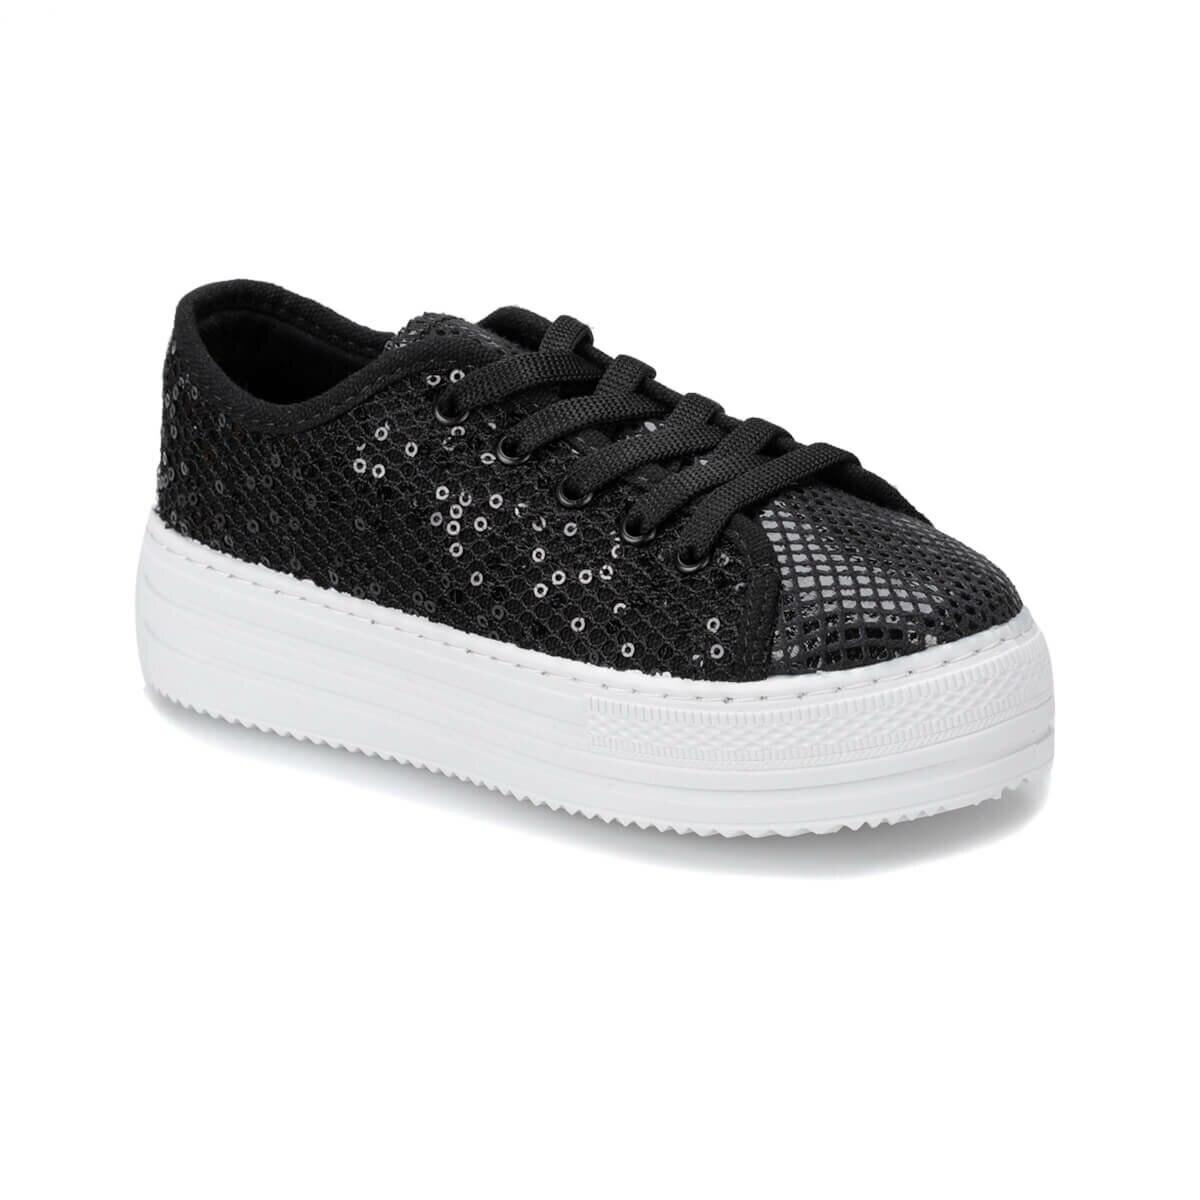 FLO 91. DESY-2. F Black Female Child Shoes PINKSTEP